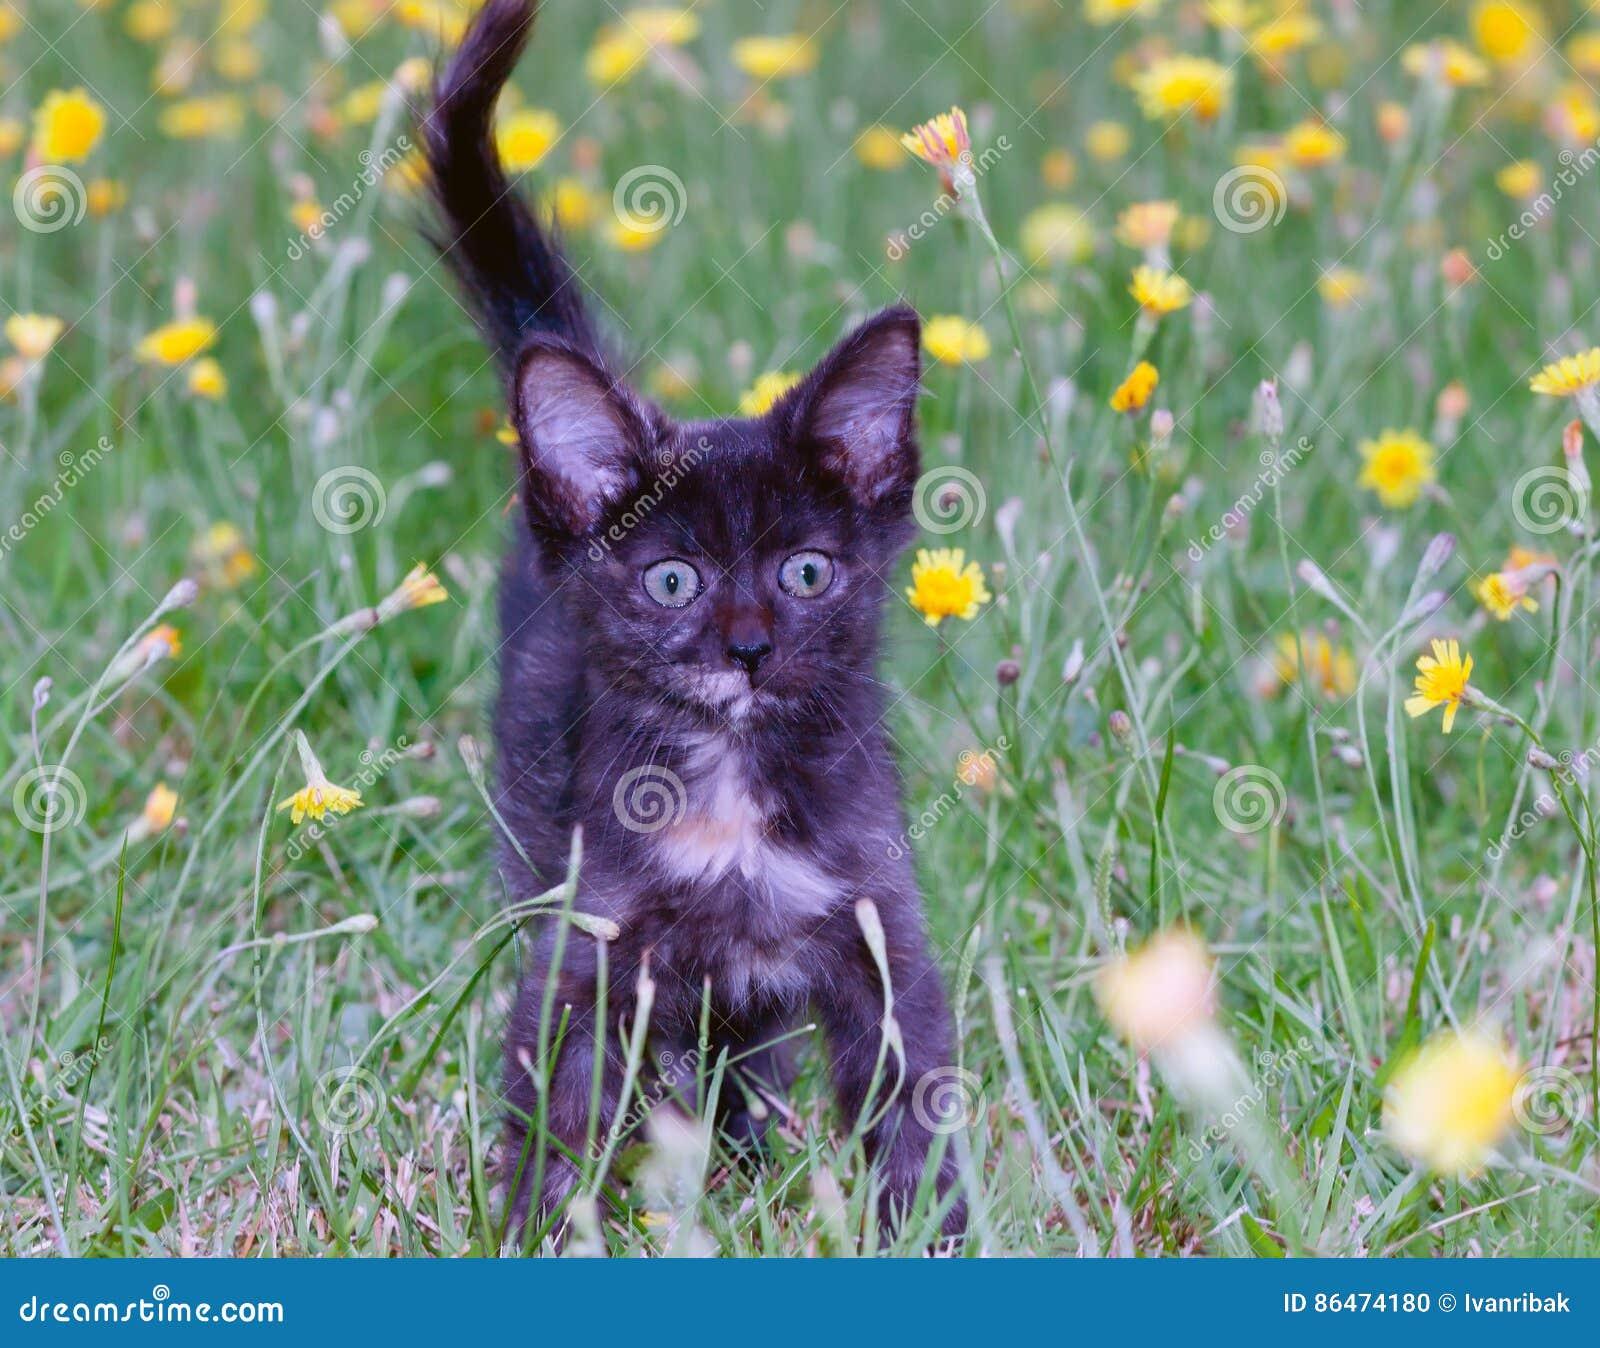 Clumsy little kitten on the